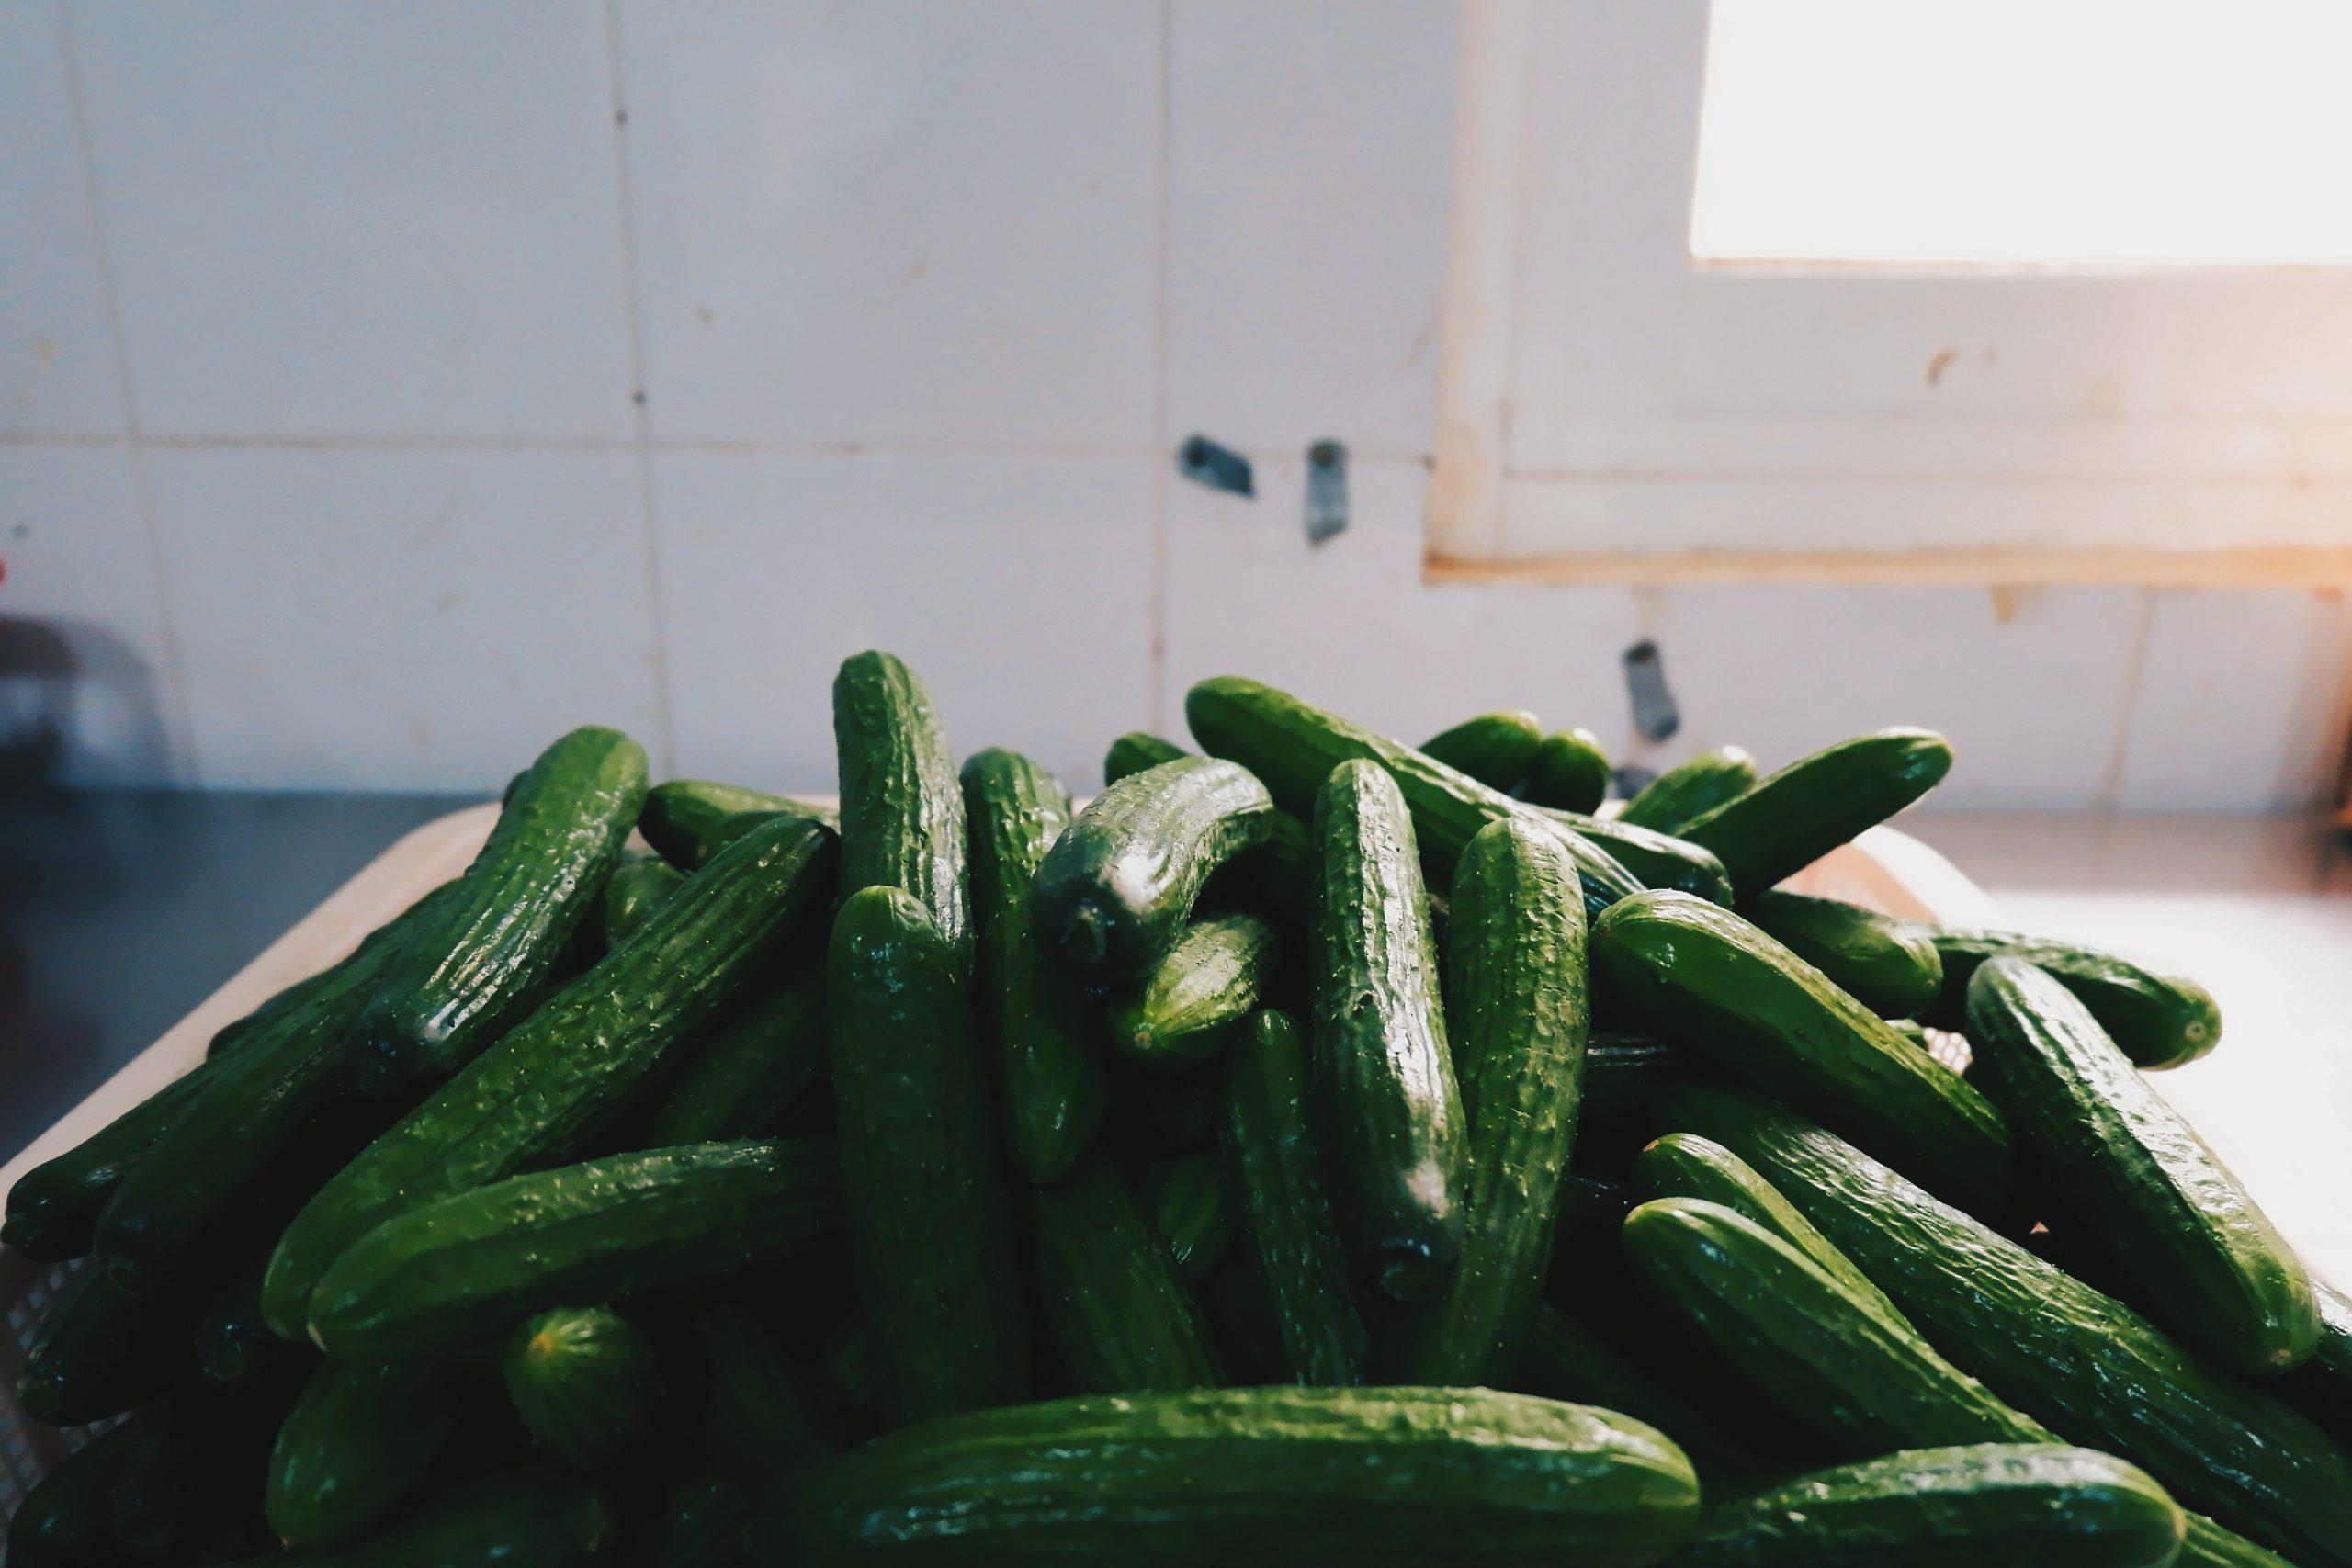 Cucumber photo by Deviyahya on Unsplash